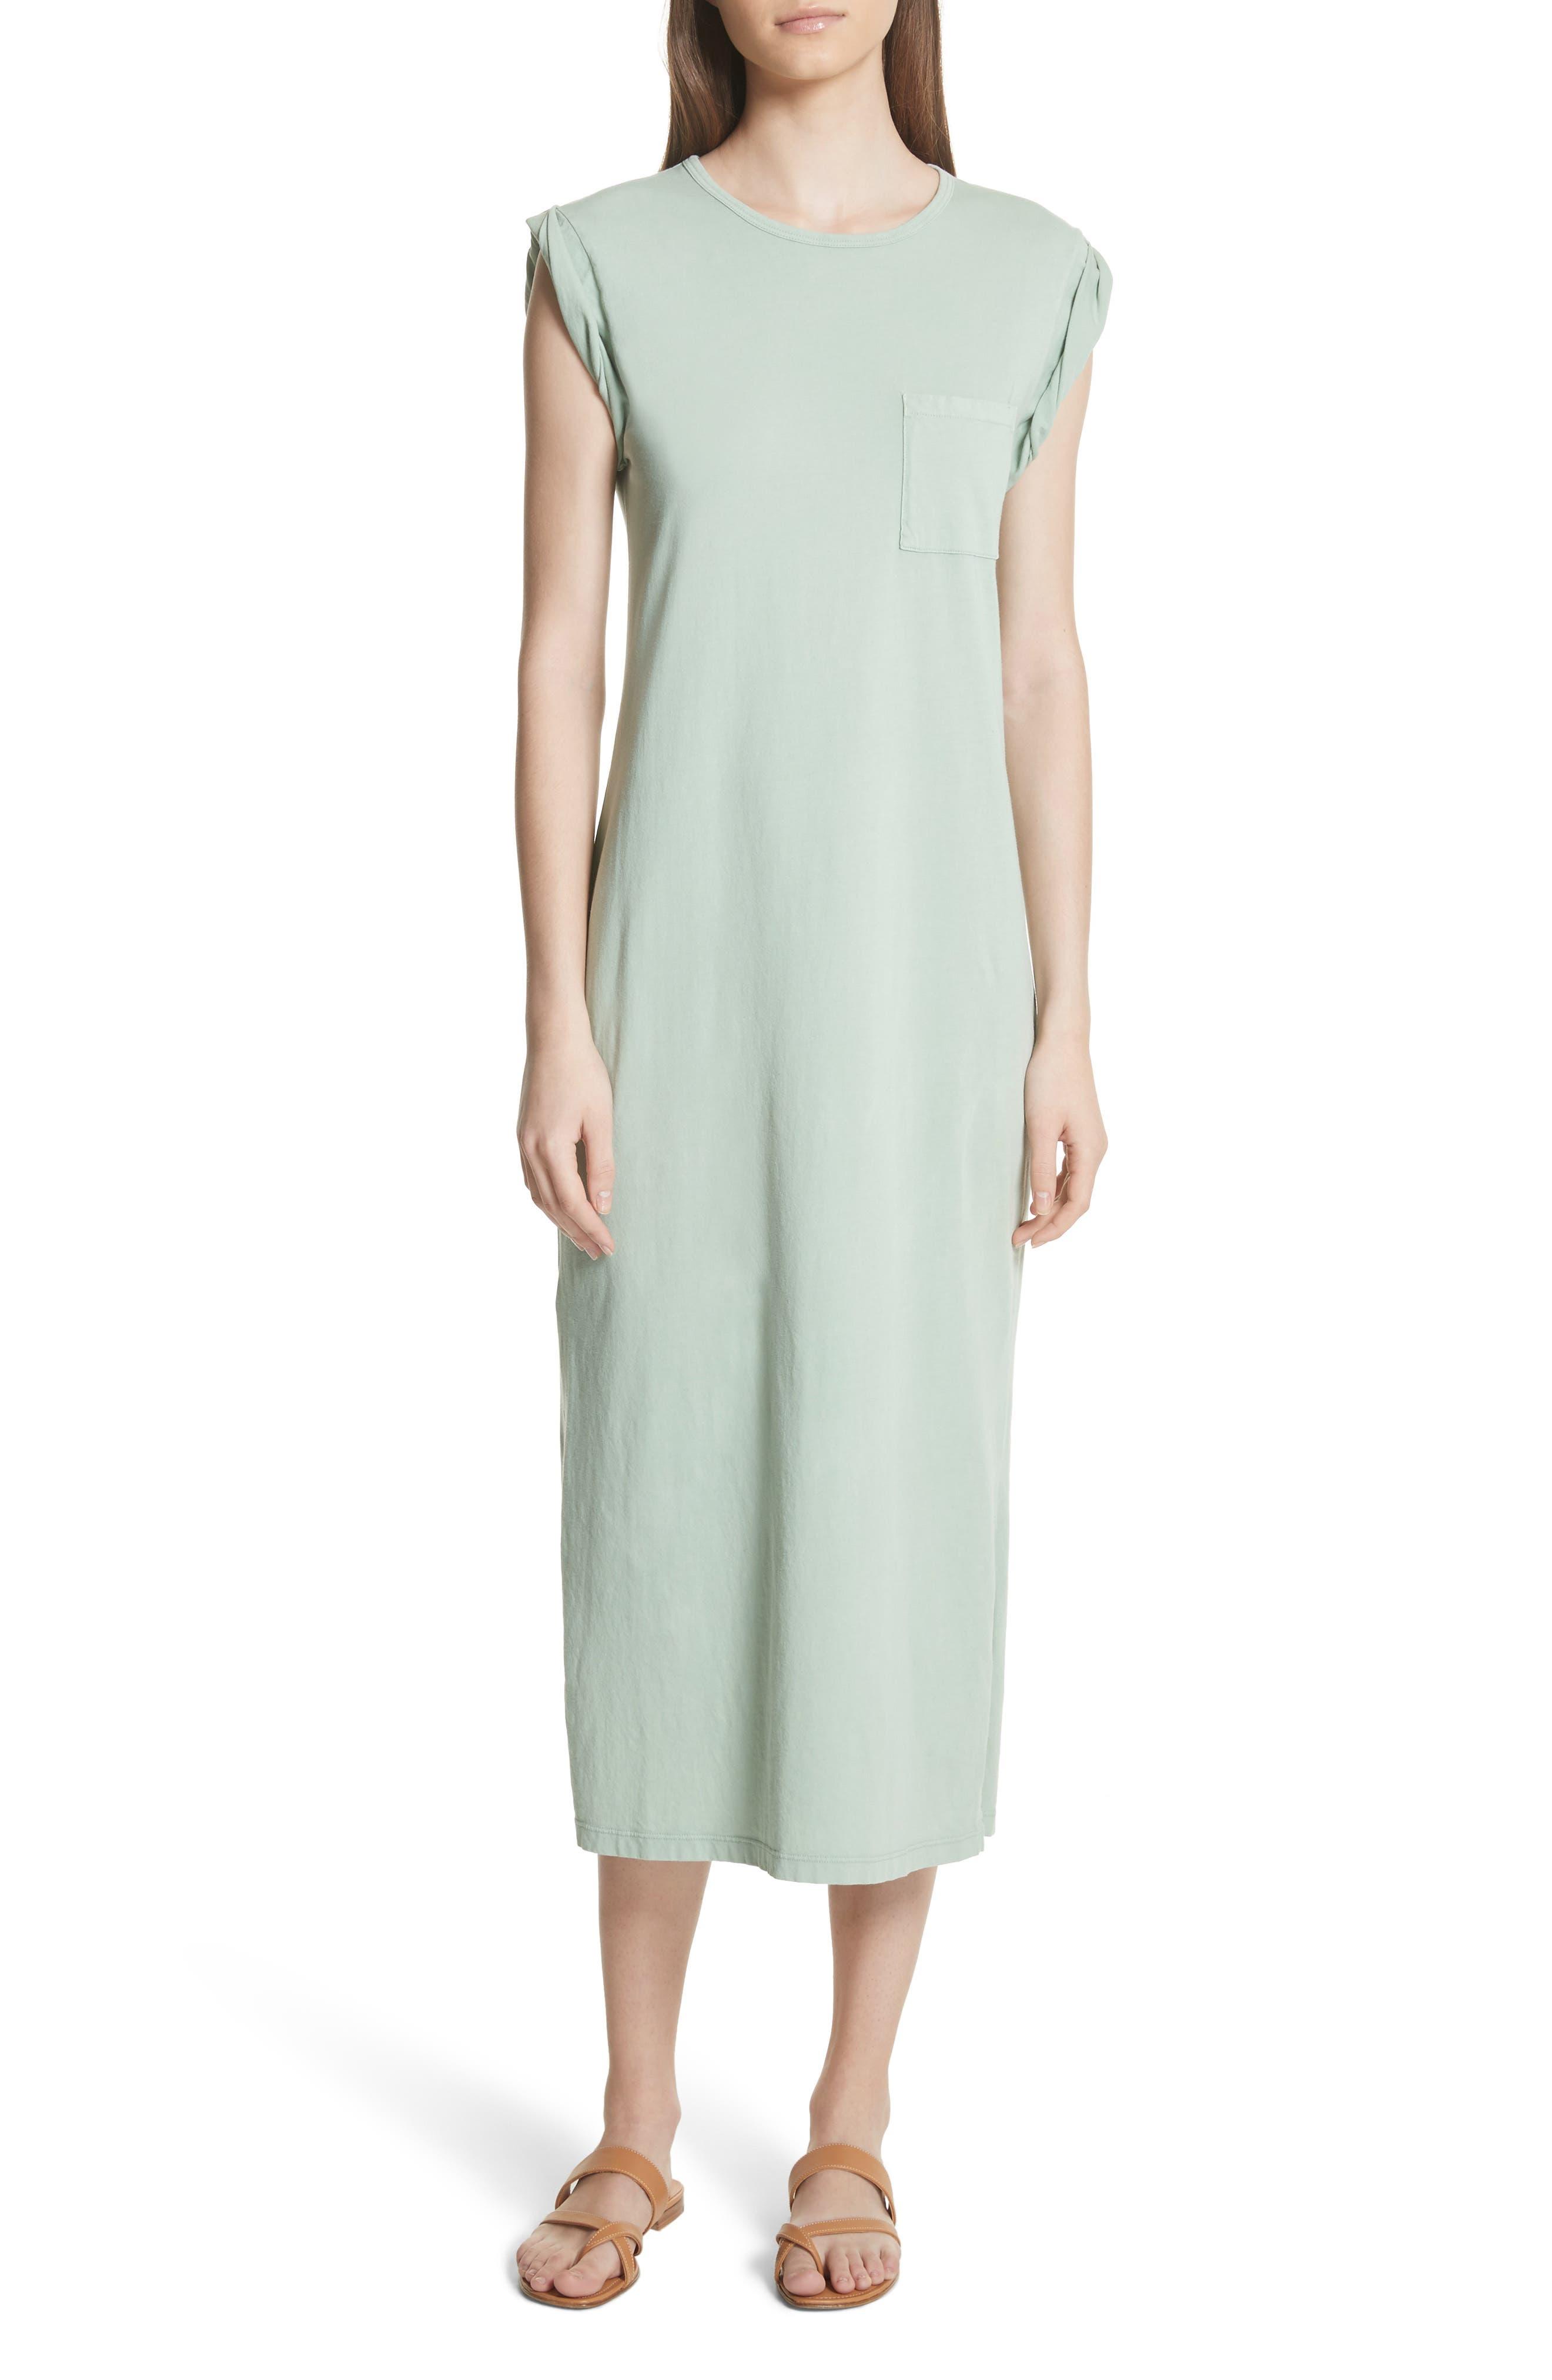 Muscle P Relaxed T-Shirt Dress,                             Main thumbnail 1, color,                             Light Moss